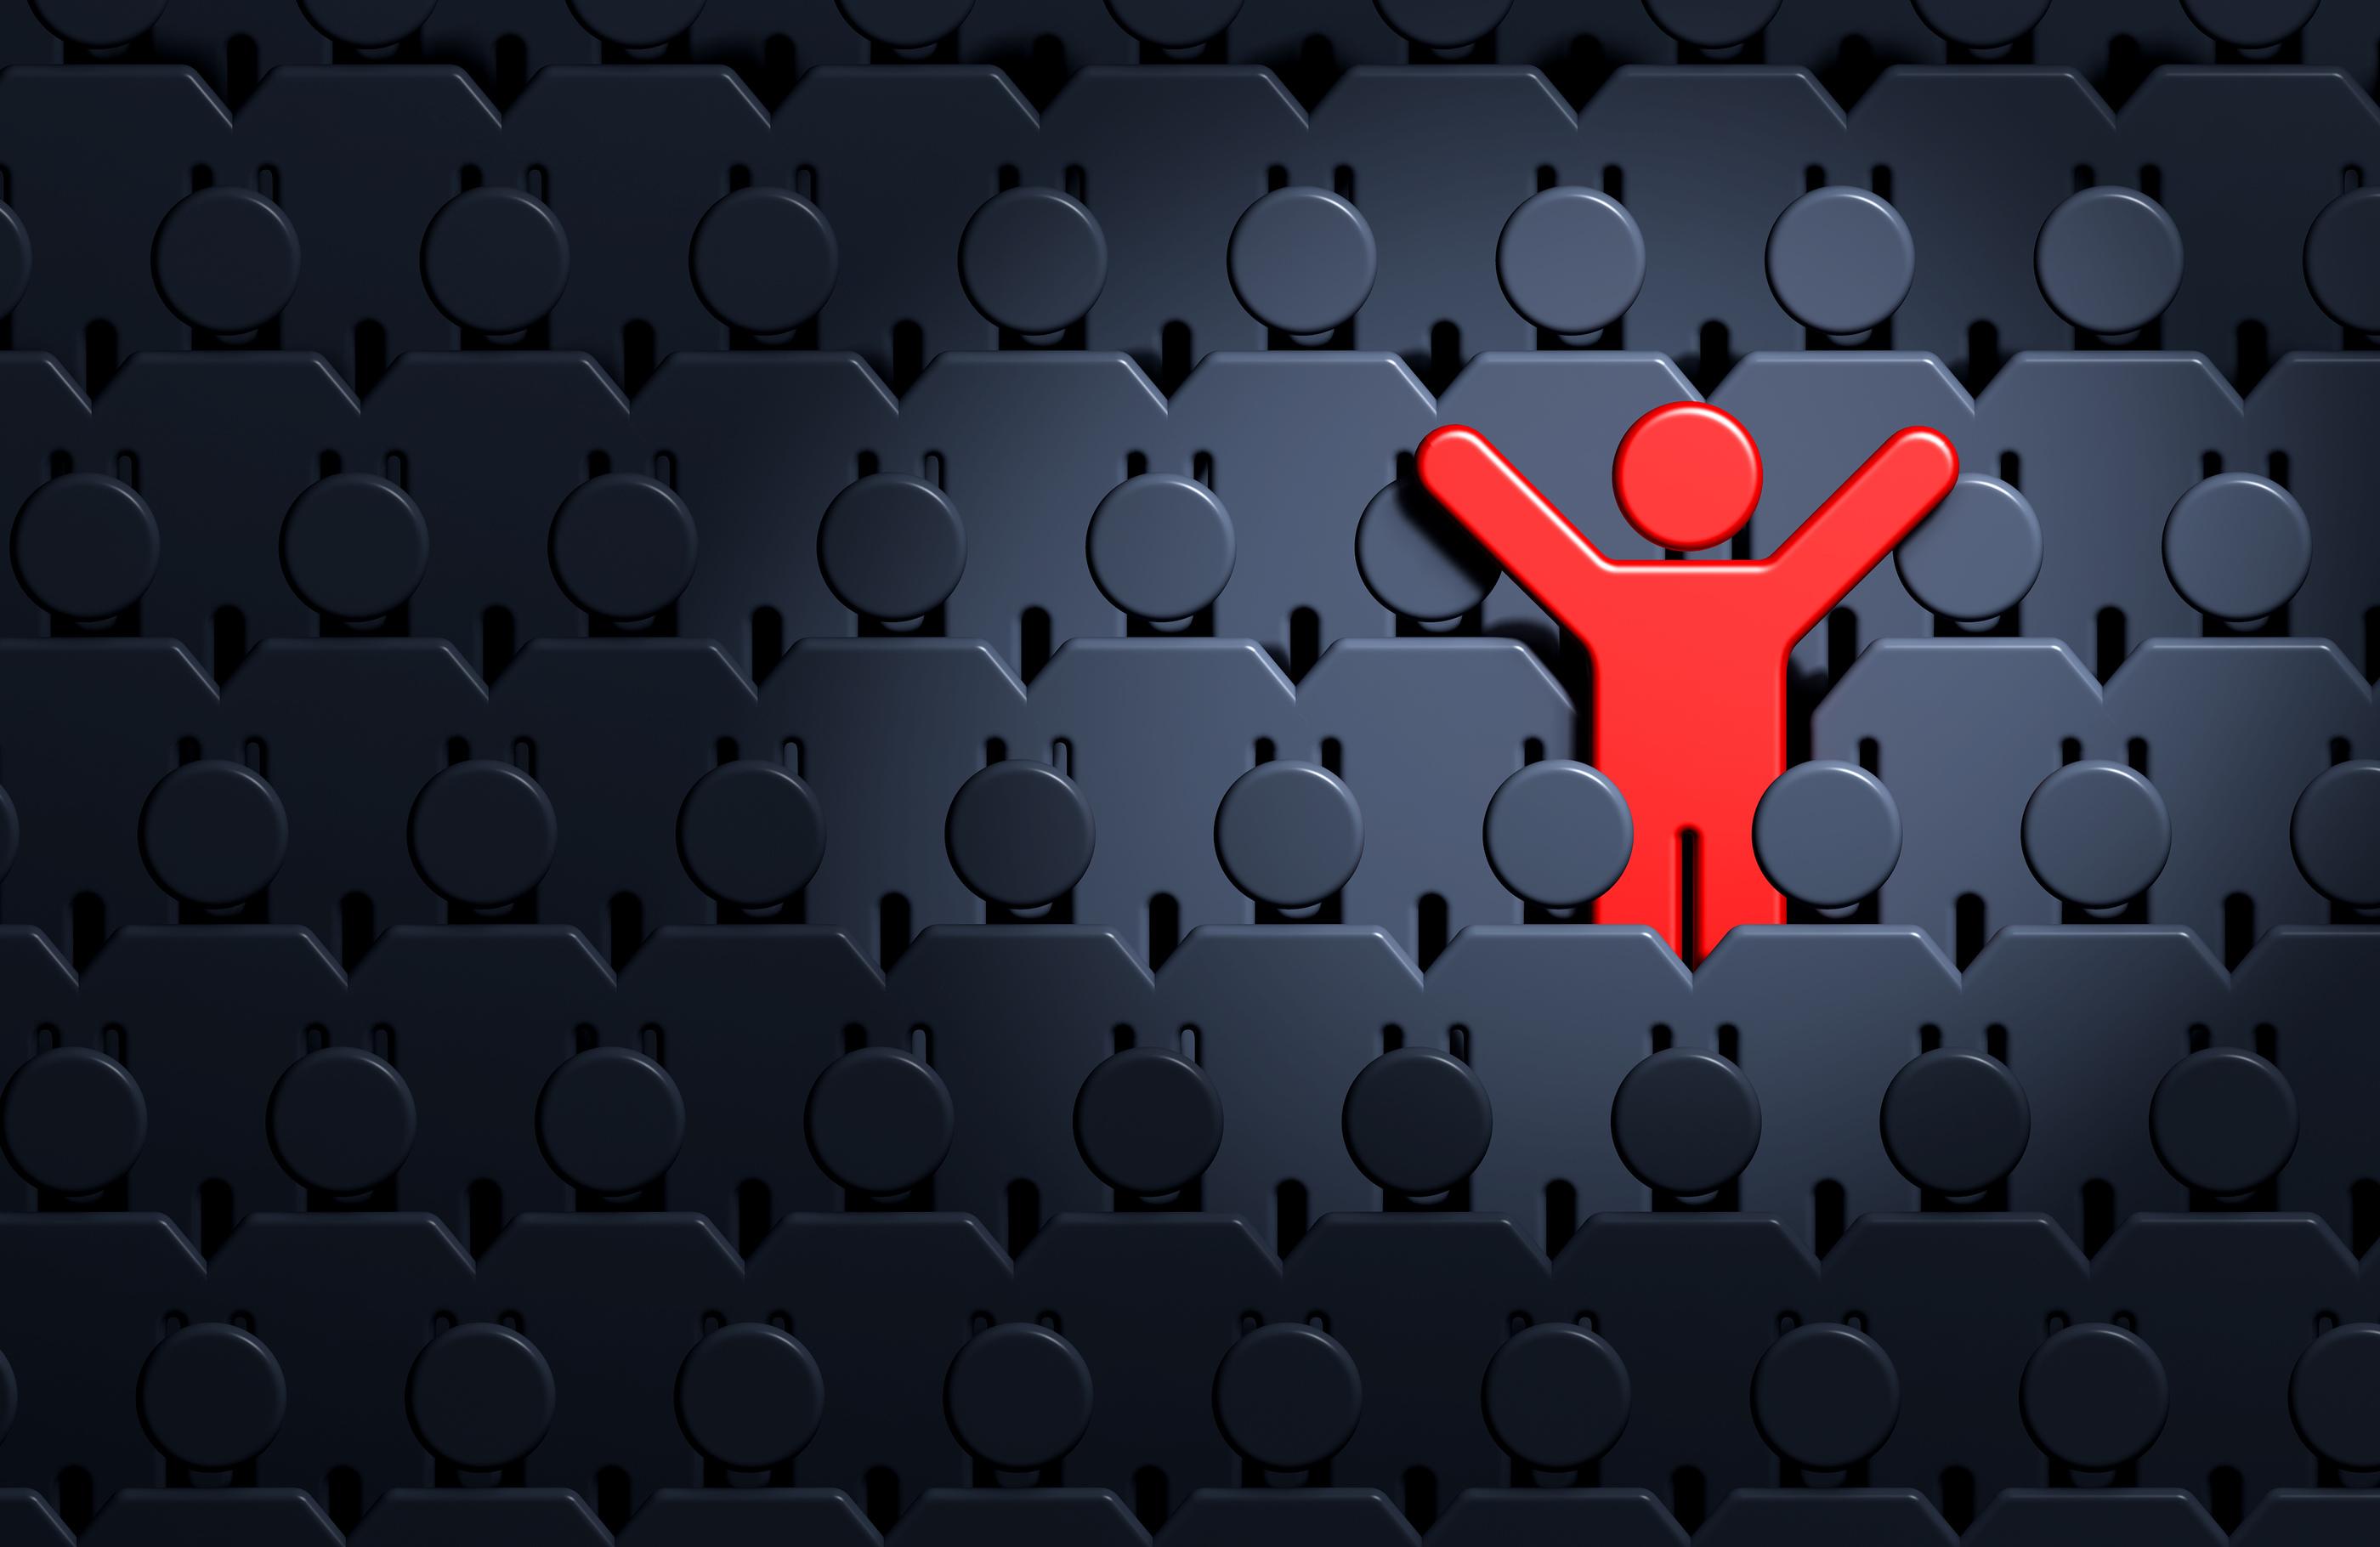 Red stickman cheering - bandv Hampshire pr agency